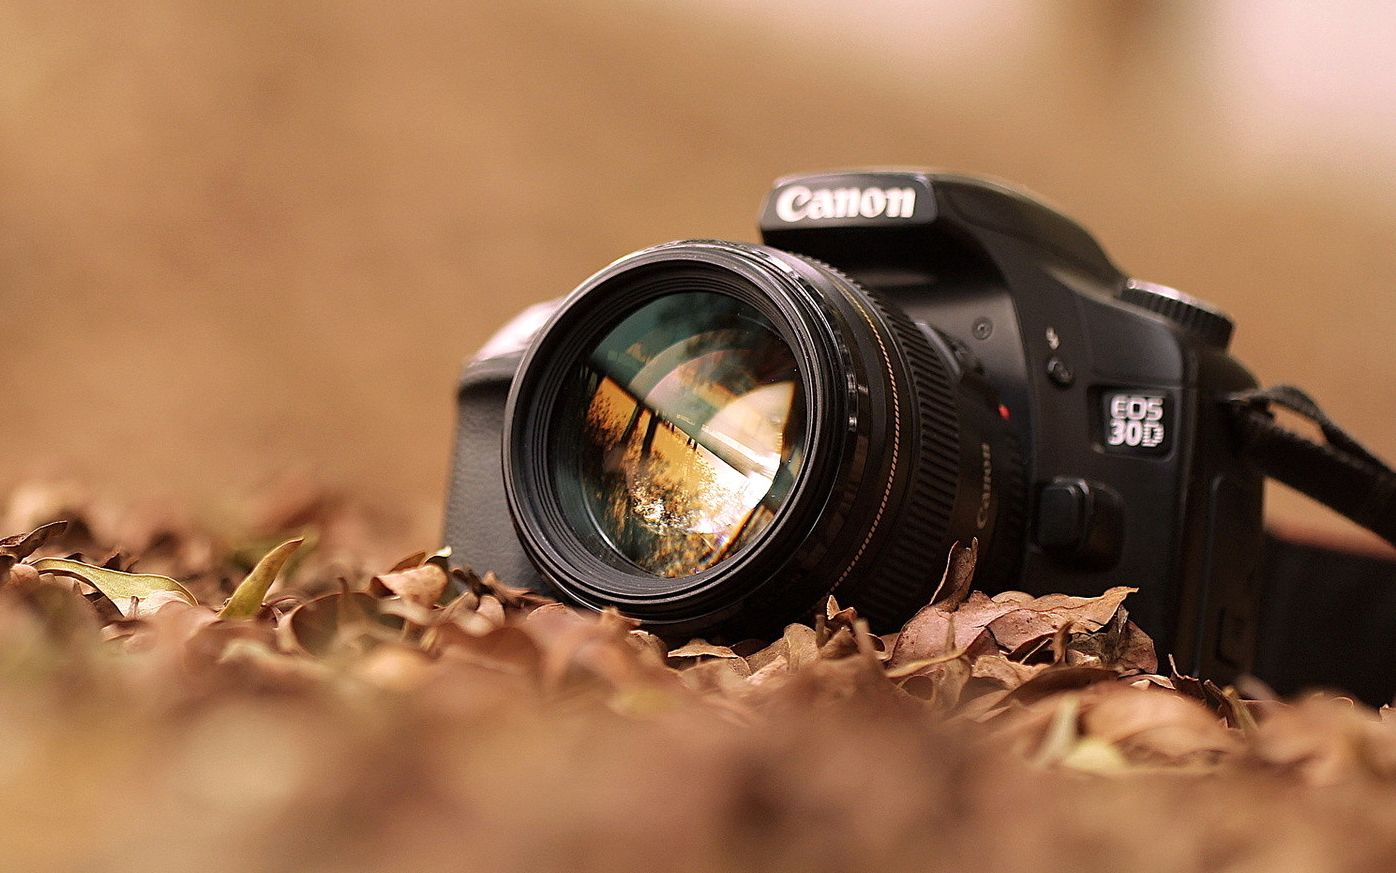 One of my favorite hobbies. Photography | WIS DigLit Kai Lambon ...